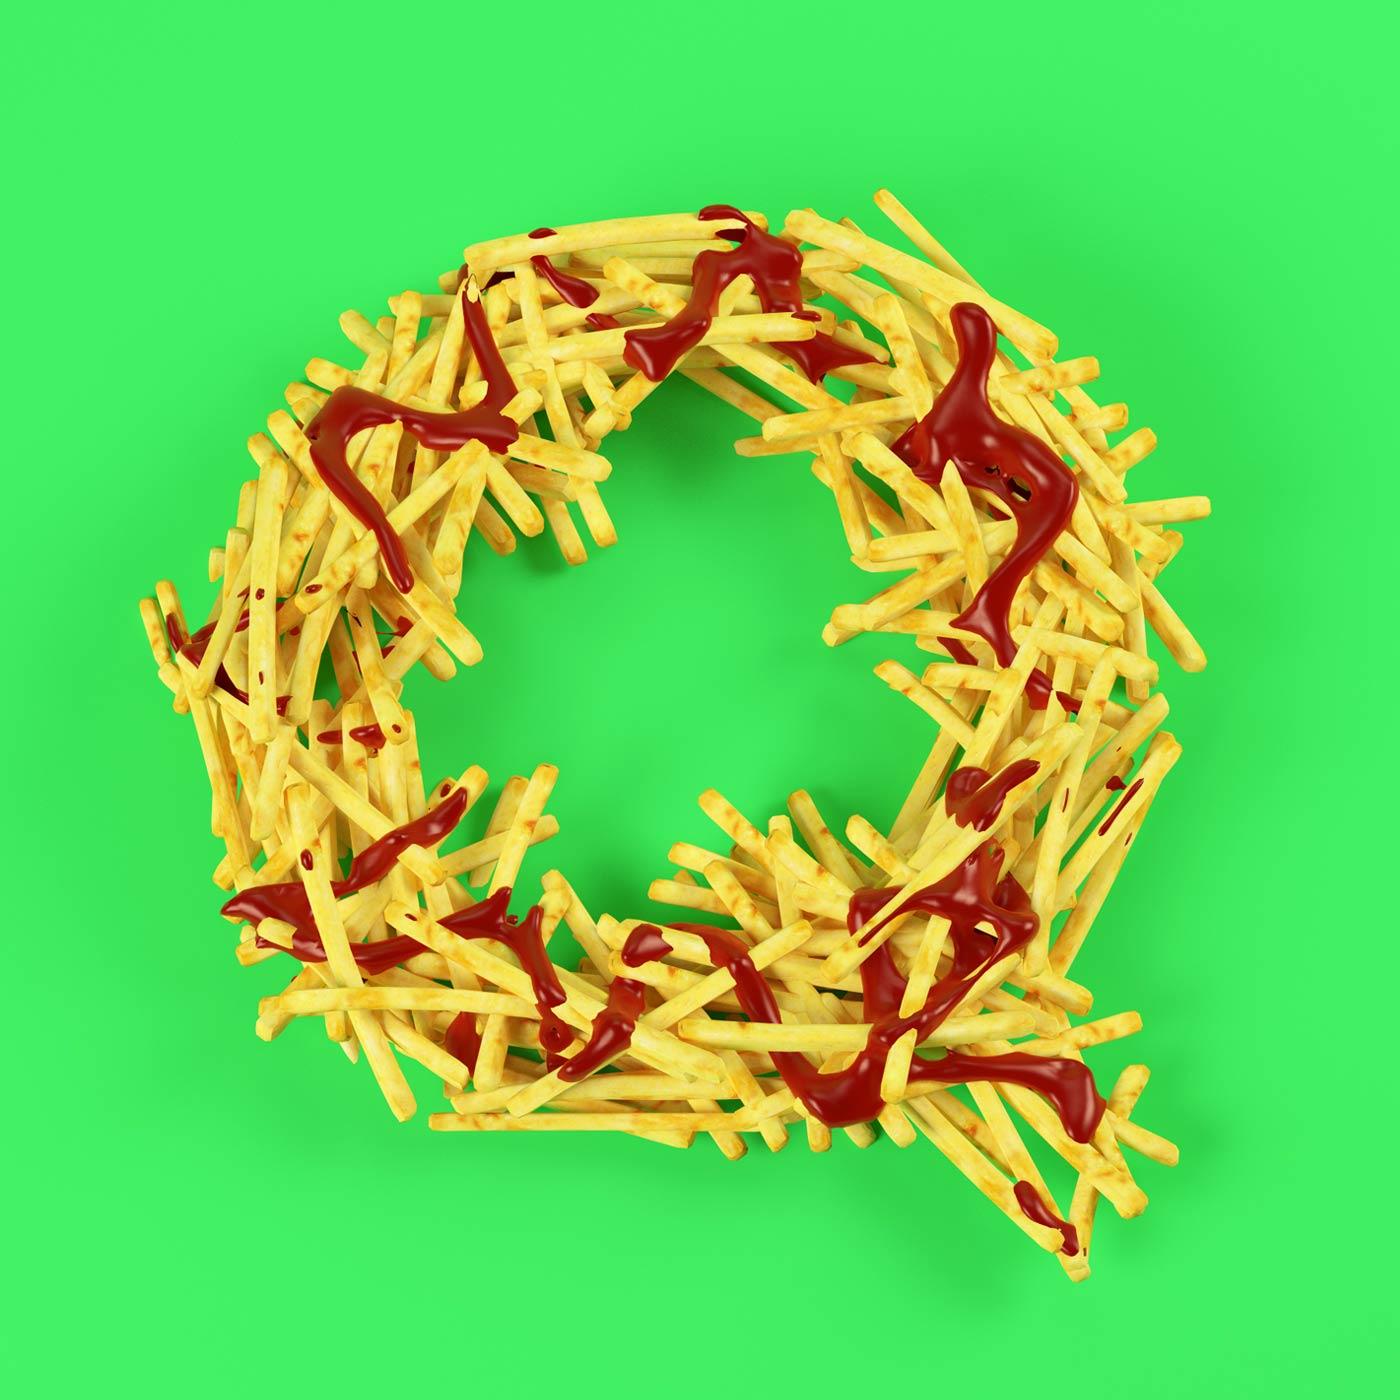 FOOD 3DFOOD FOODALPHABET CESS 3D 3DTYPE LETTERING CGI 3DARTIST FRIES